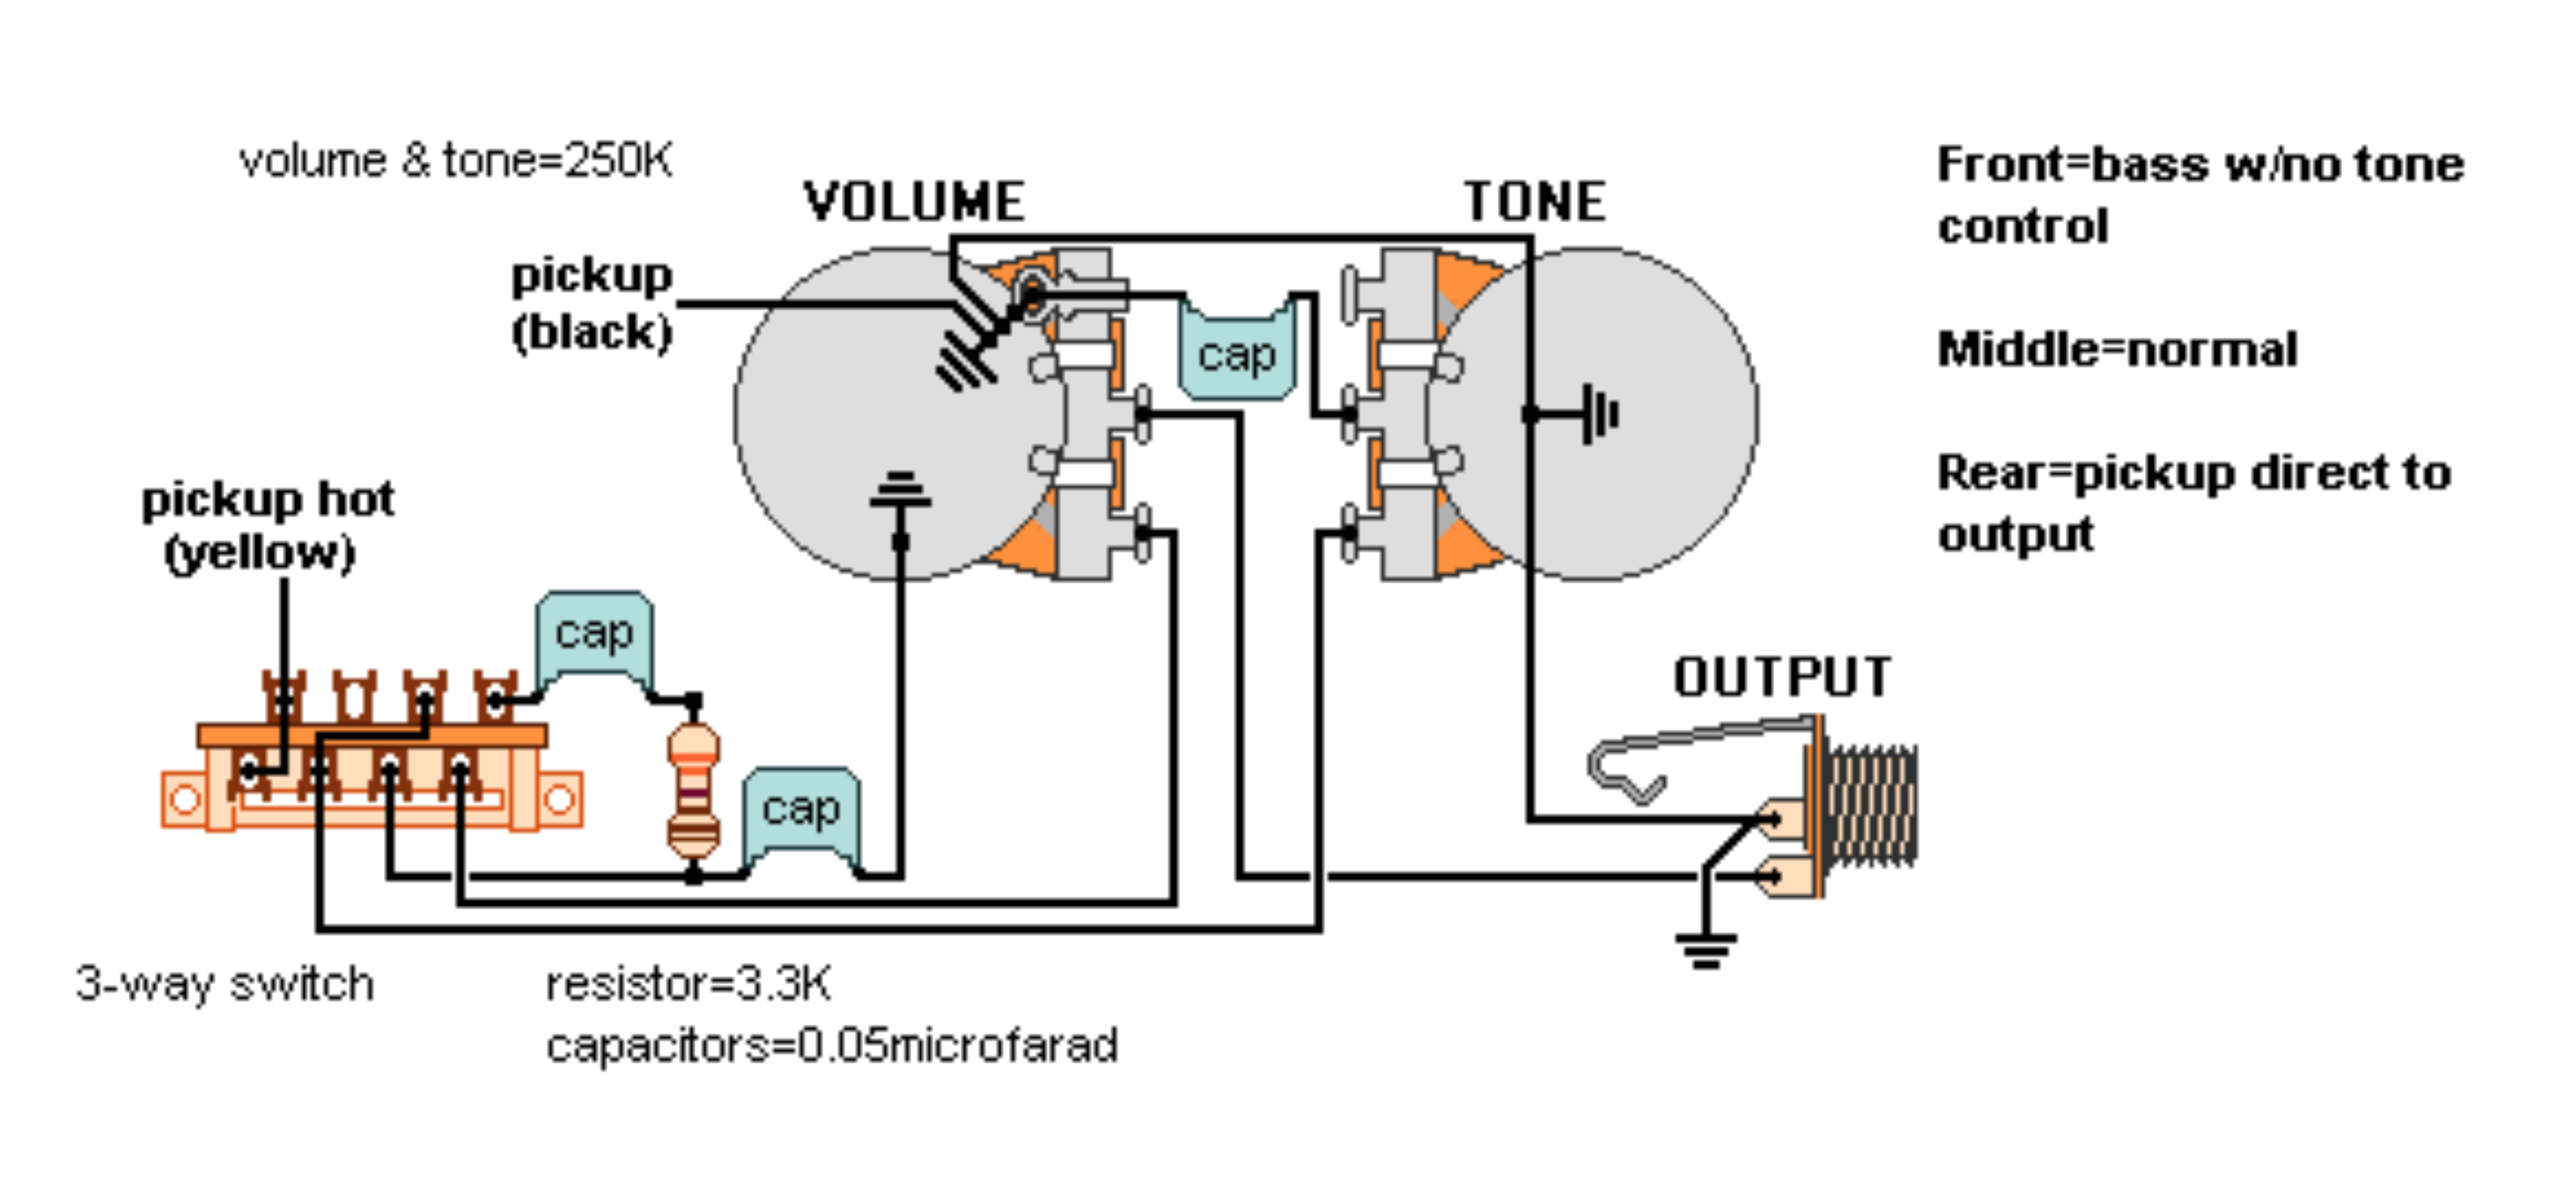 esquire 5 way wiring diagram wiring diagram sheet esquire 5 way wiring diagram wiring diagram show